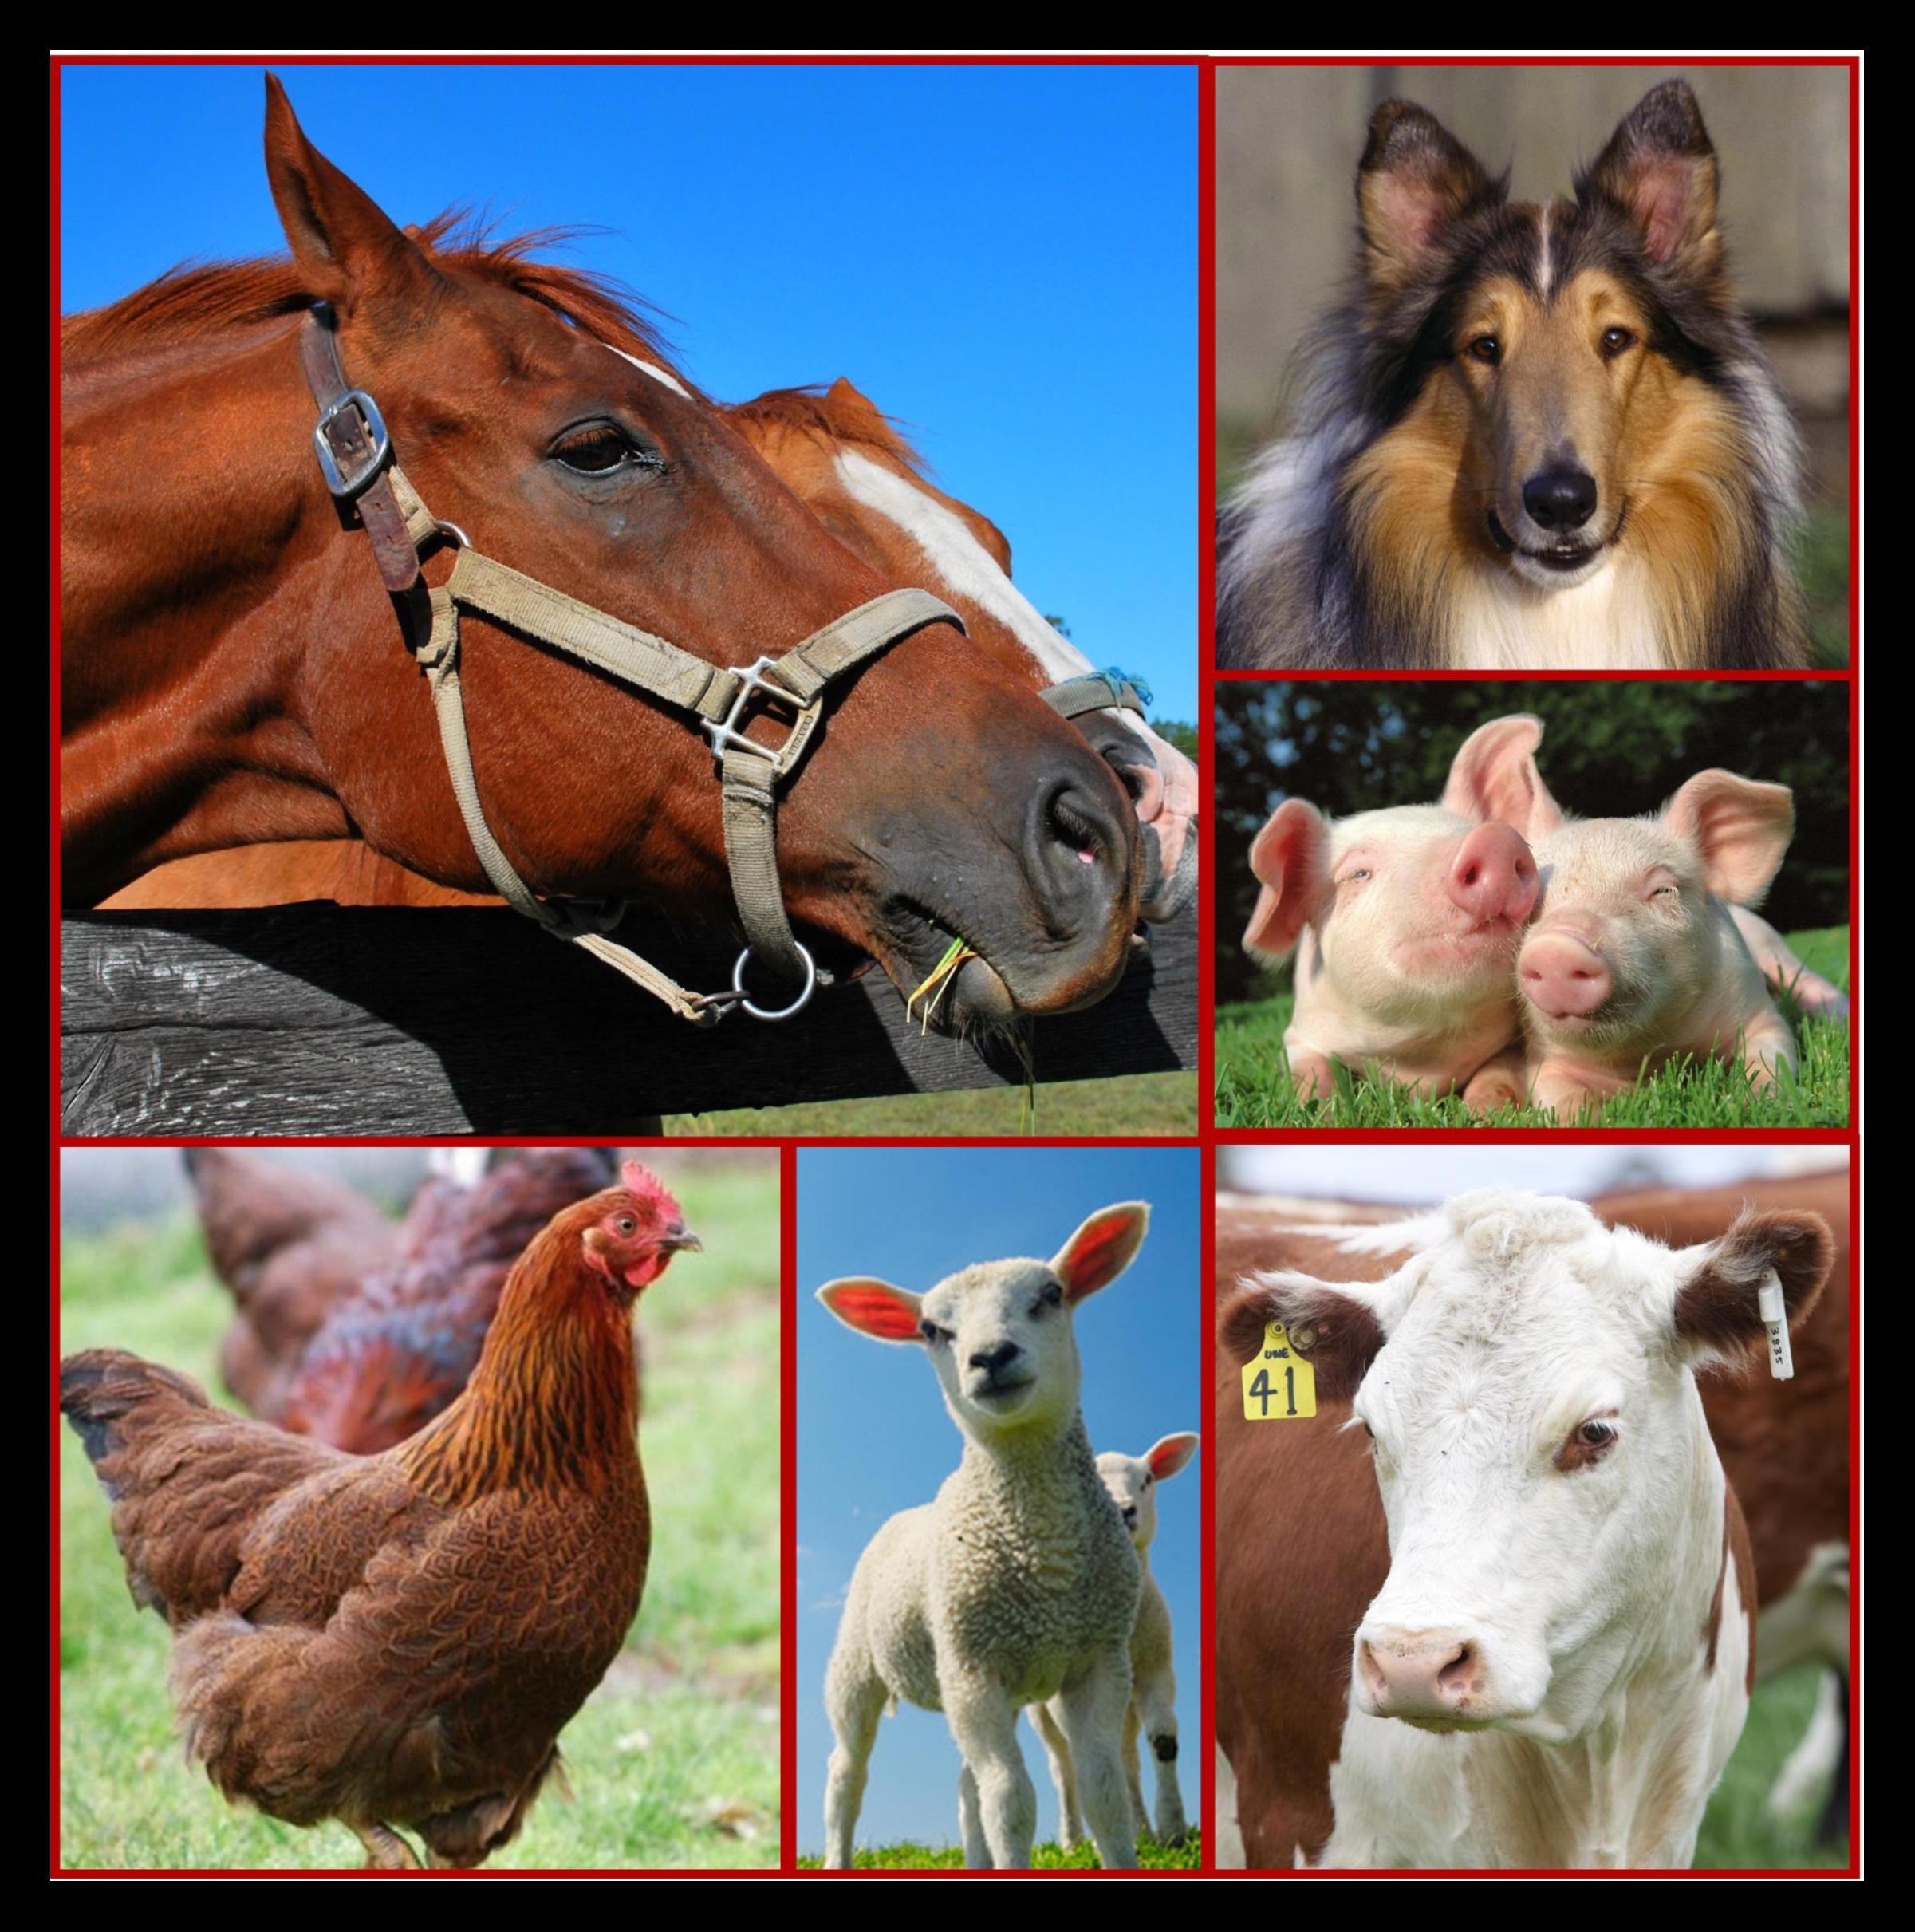 animal collage image